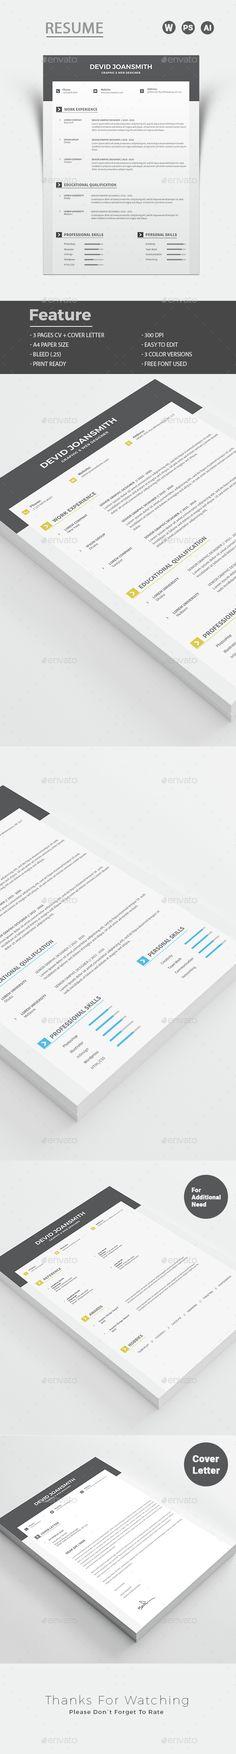 Do you copy and paste your job description into your resume